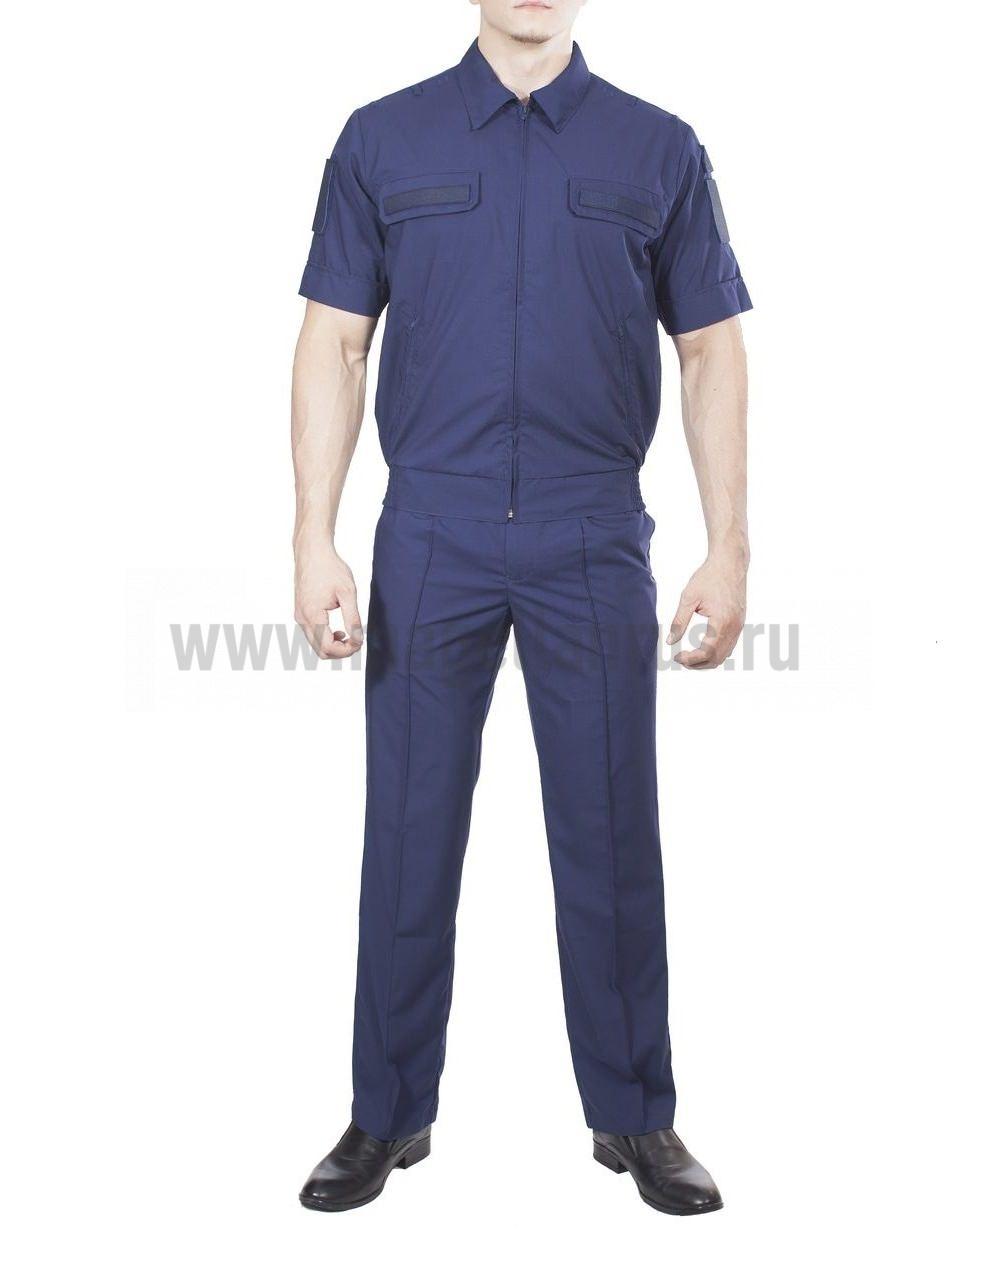 Купить Костюм летний МПА-36 штабной с коротким рукавом Синий, ткань Панацея, Магеллан